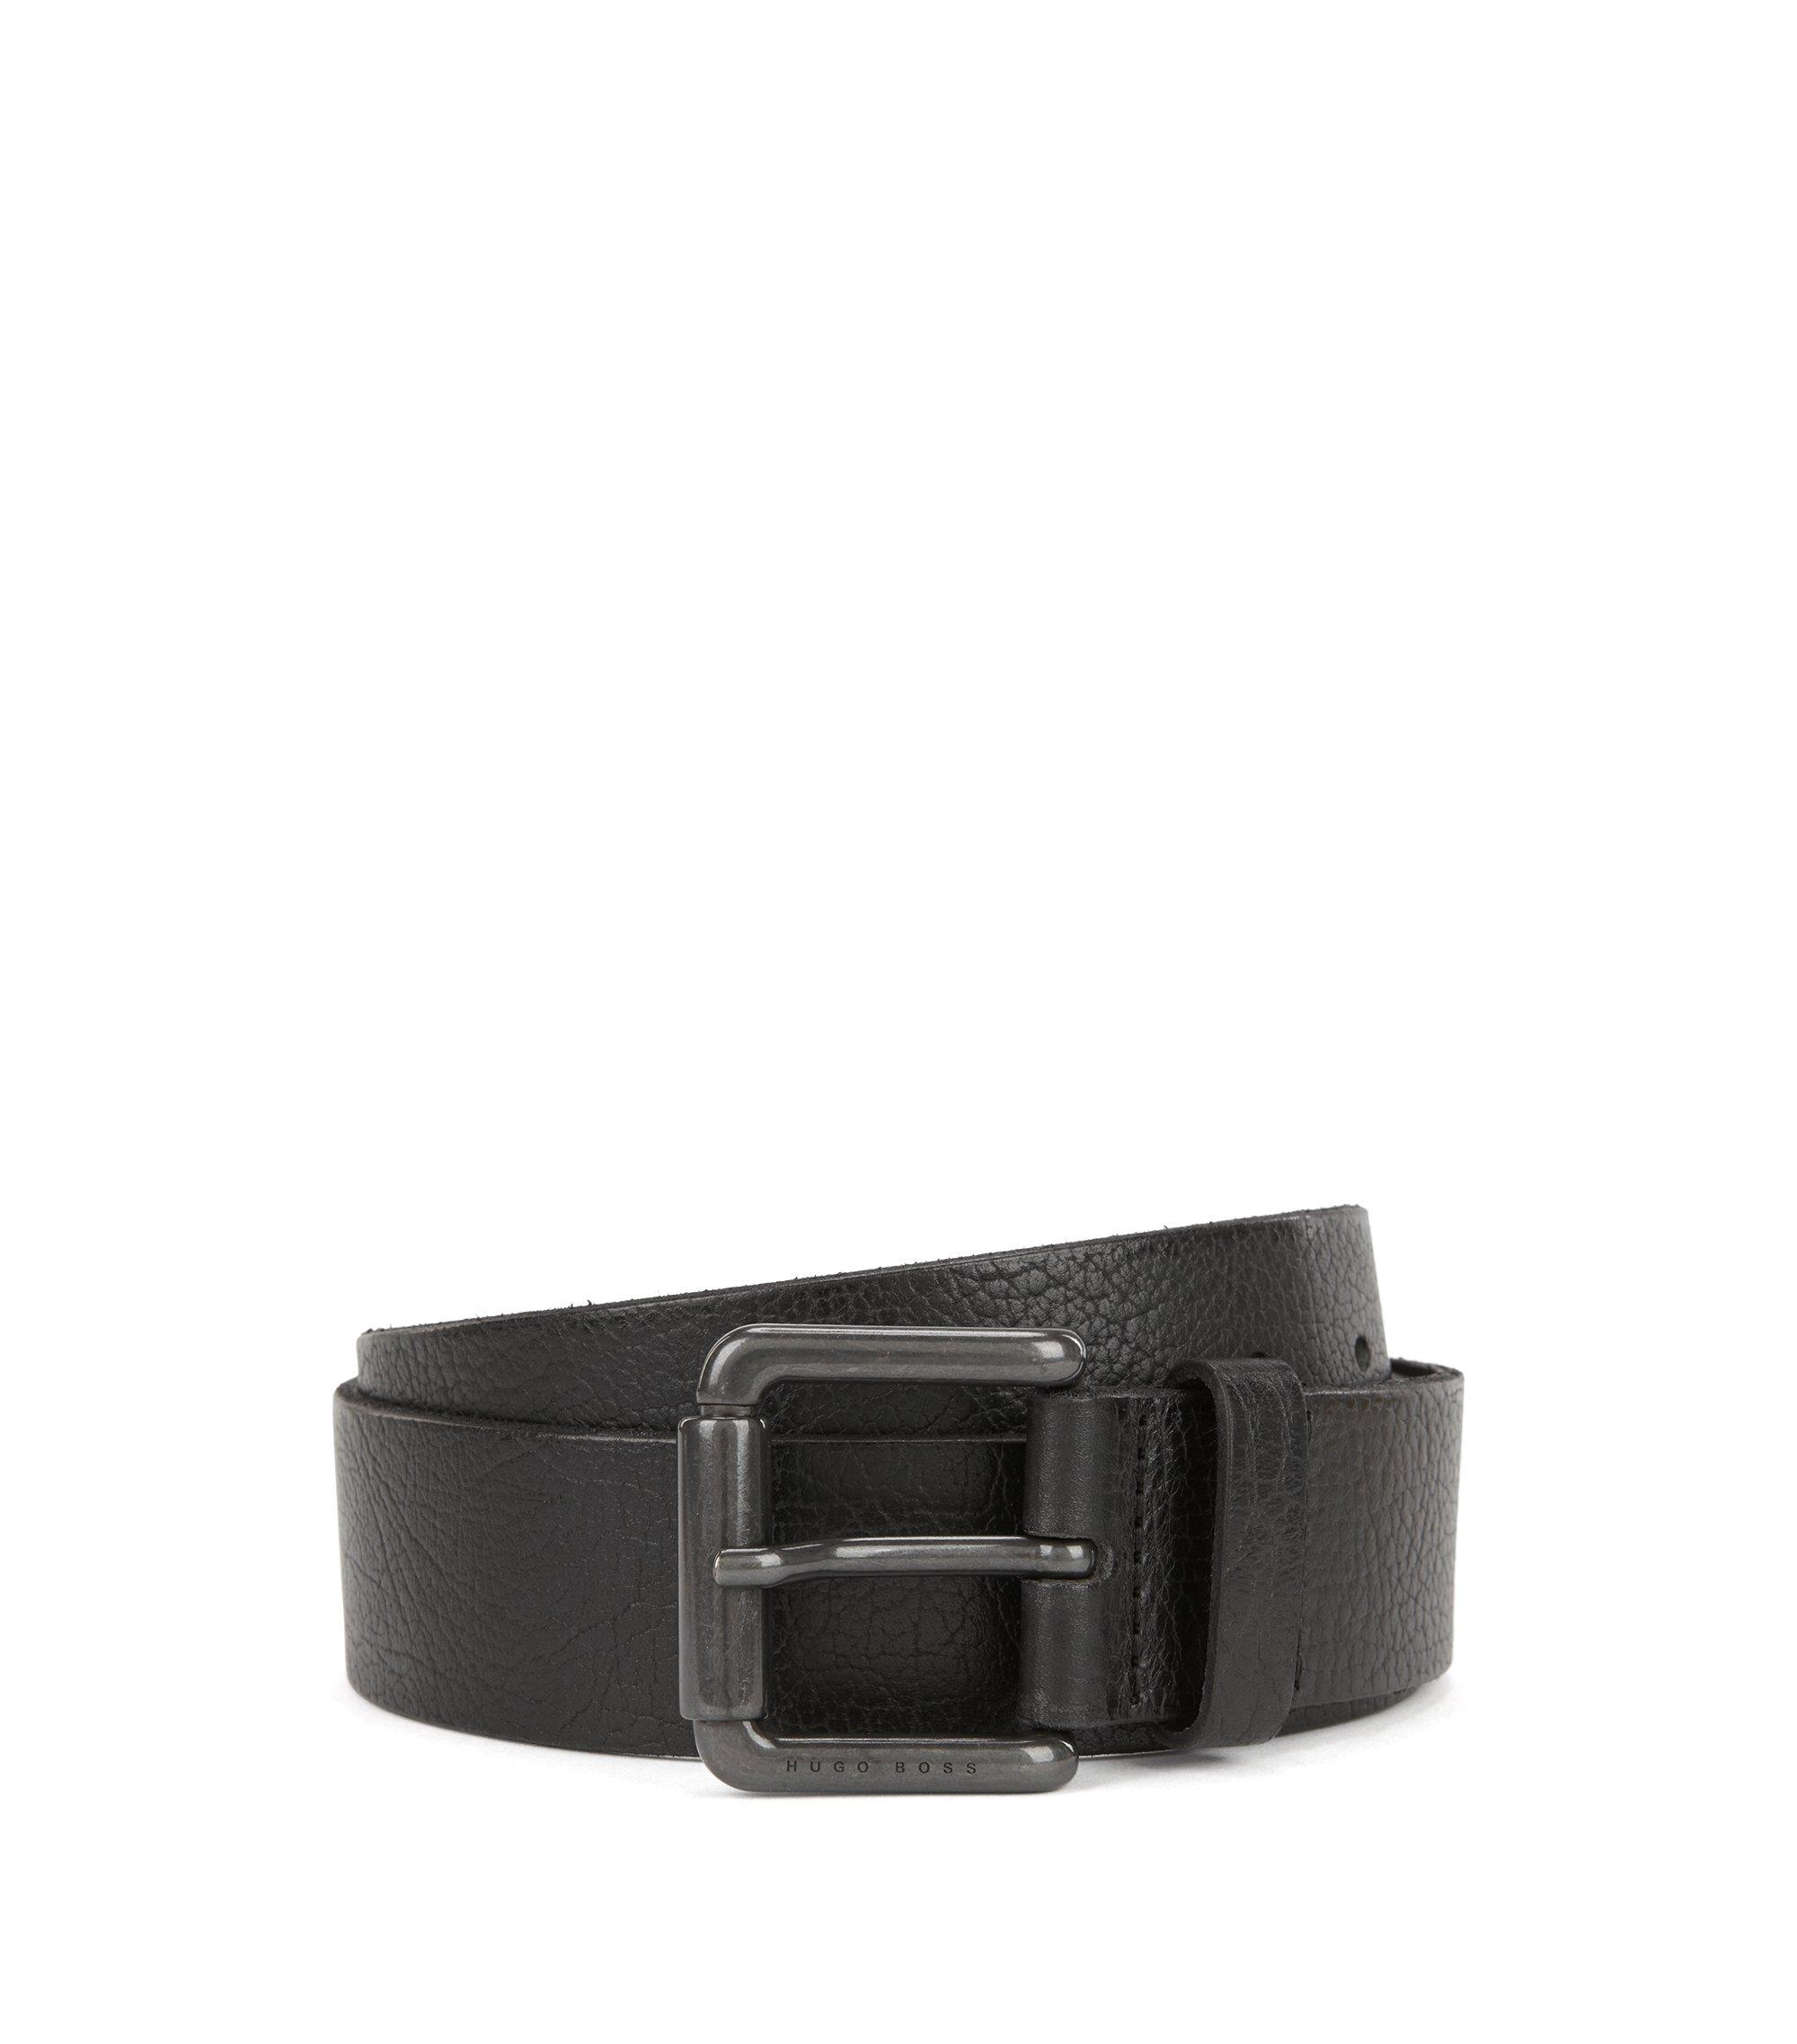 Grainy leather belt with gunmetal roller buckle, Black